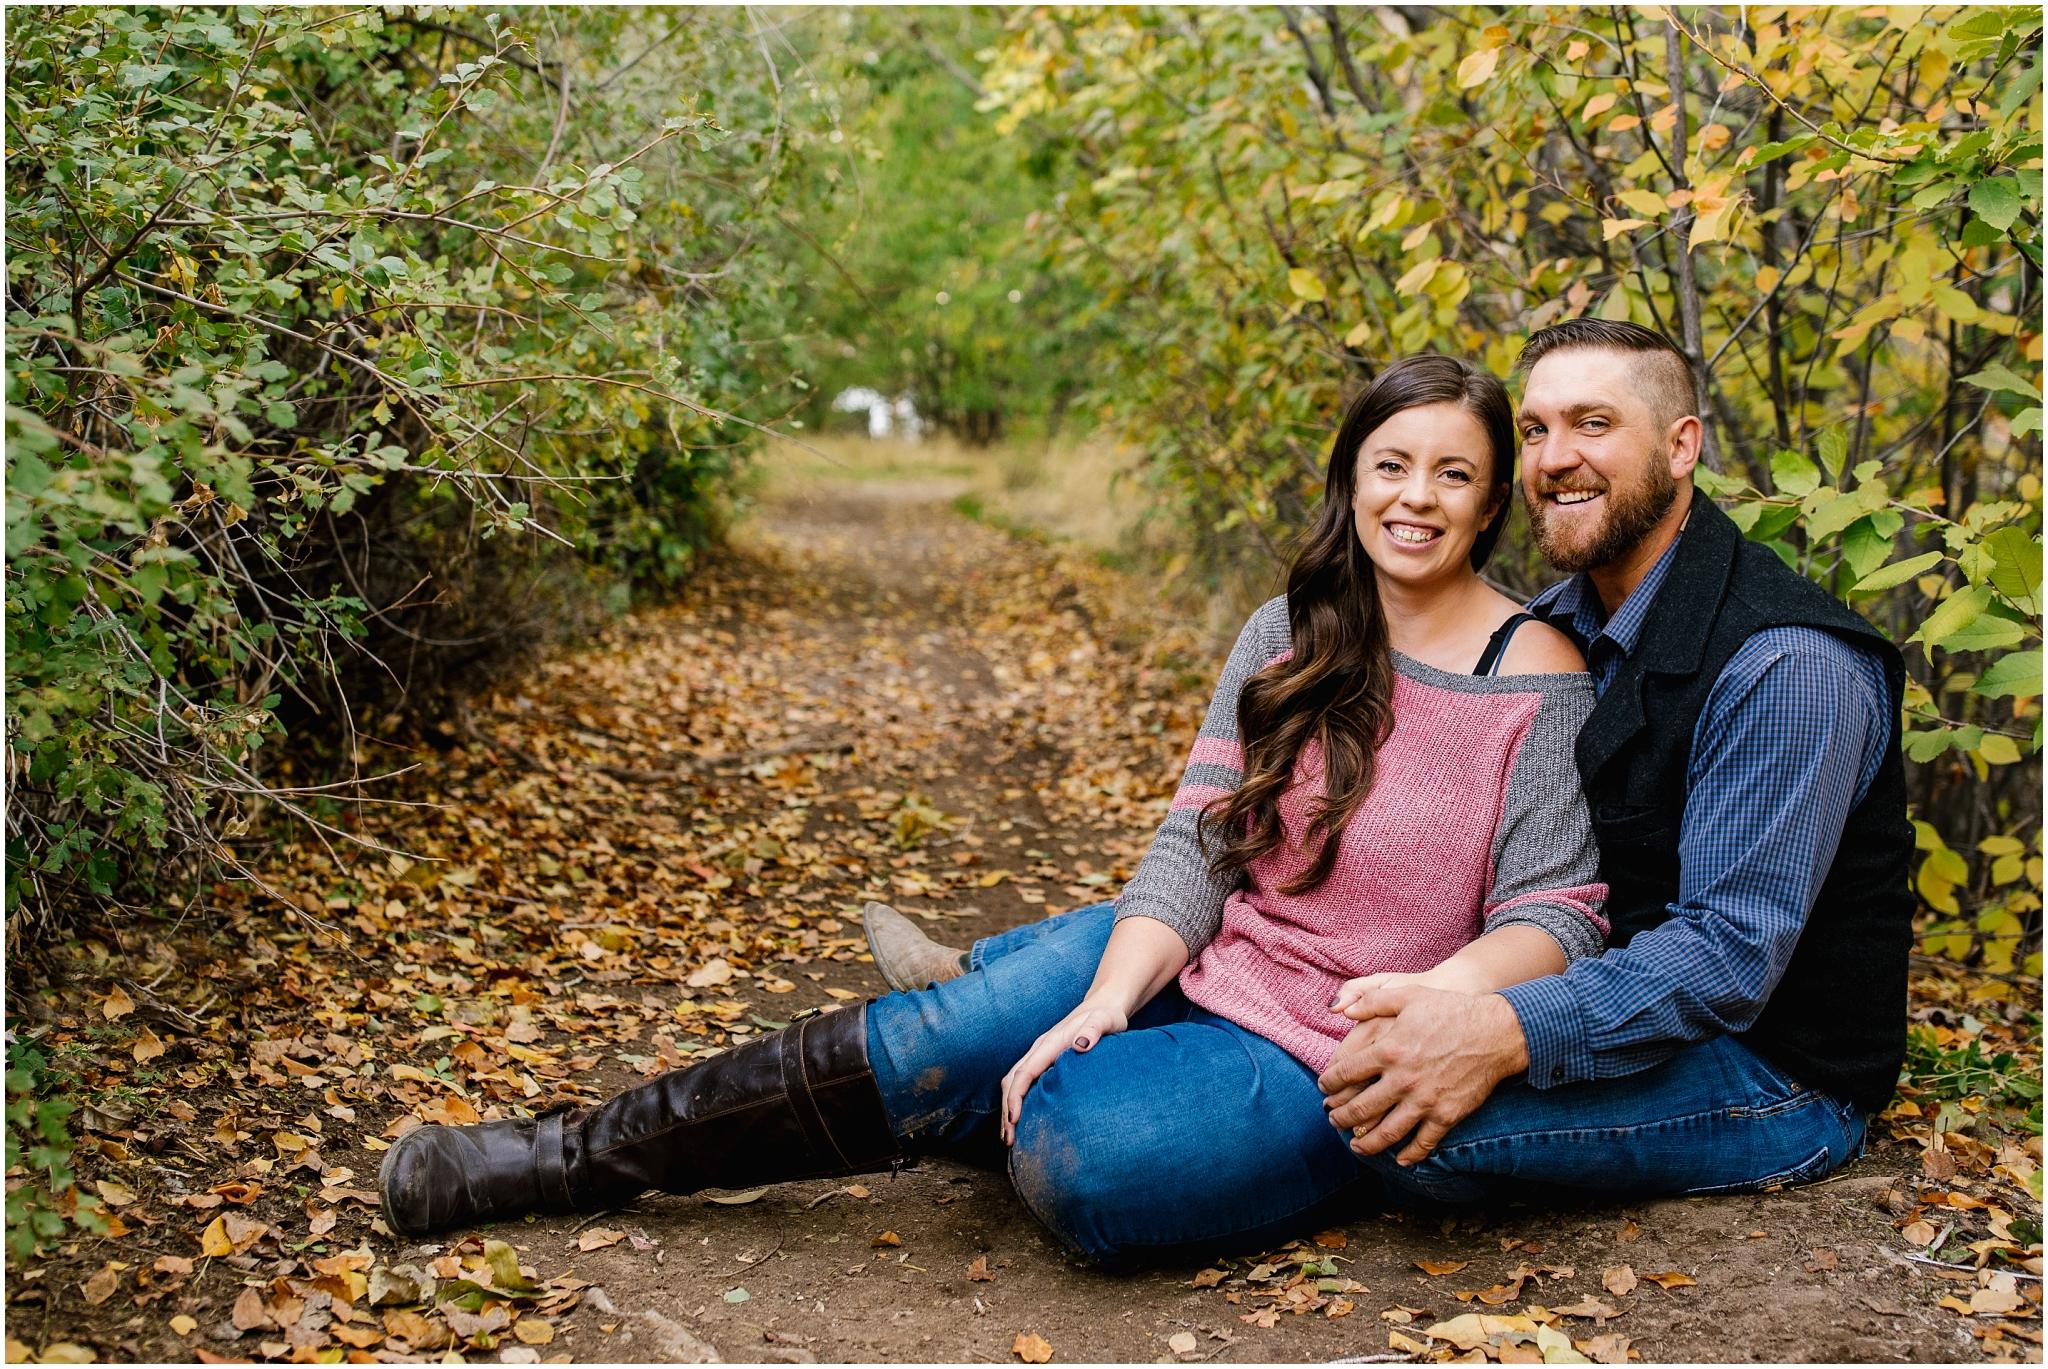 Matthews-44_Lizzie-B-Imagery-Utah-Family-Photographer-Central-Utah-Photographer-Utah-County-Nephi-Utah.jpg